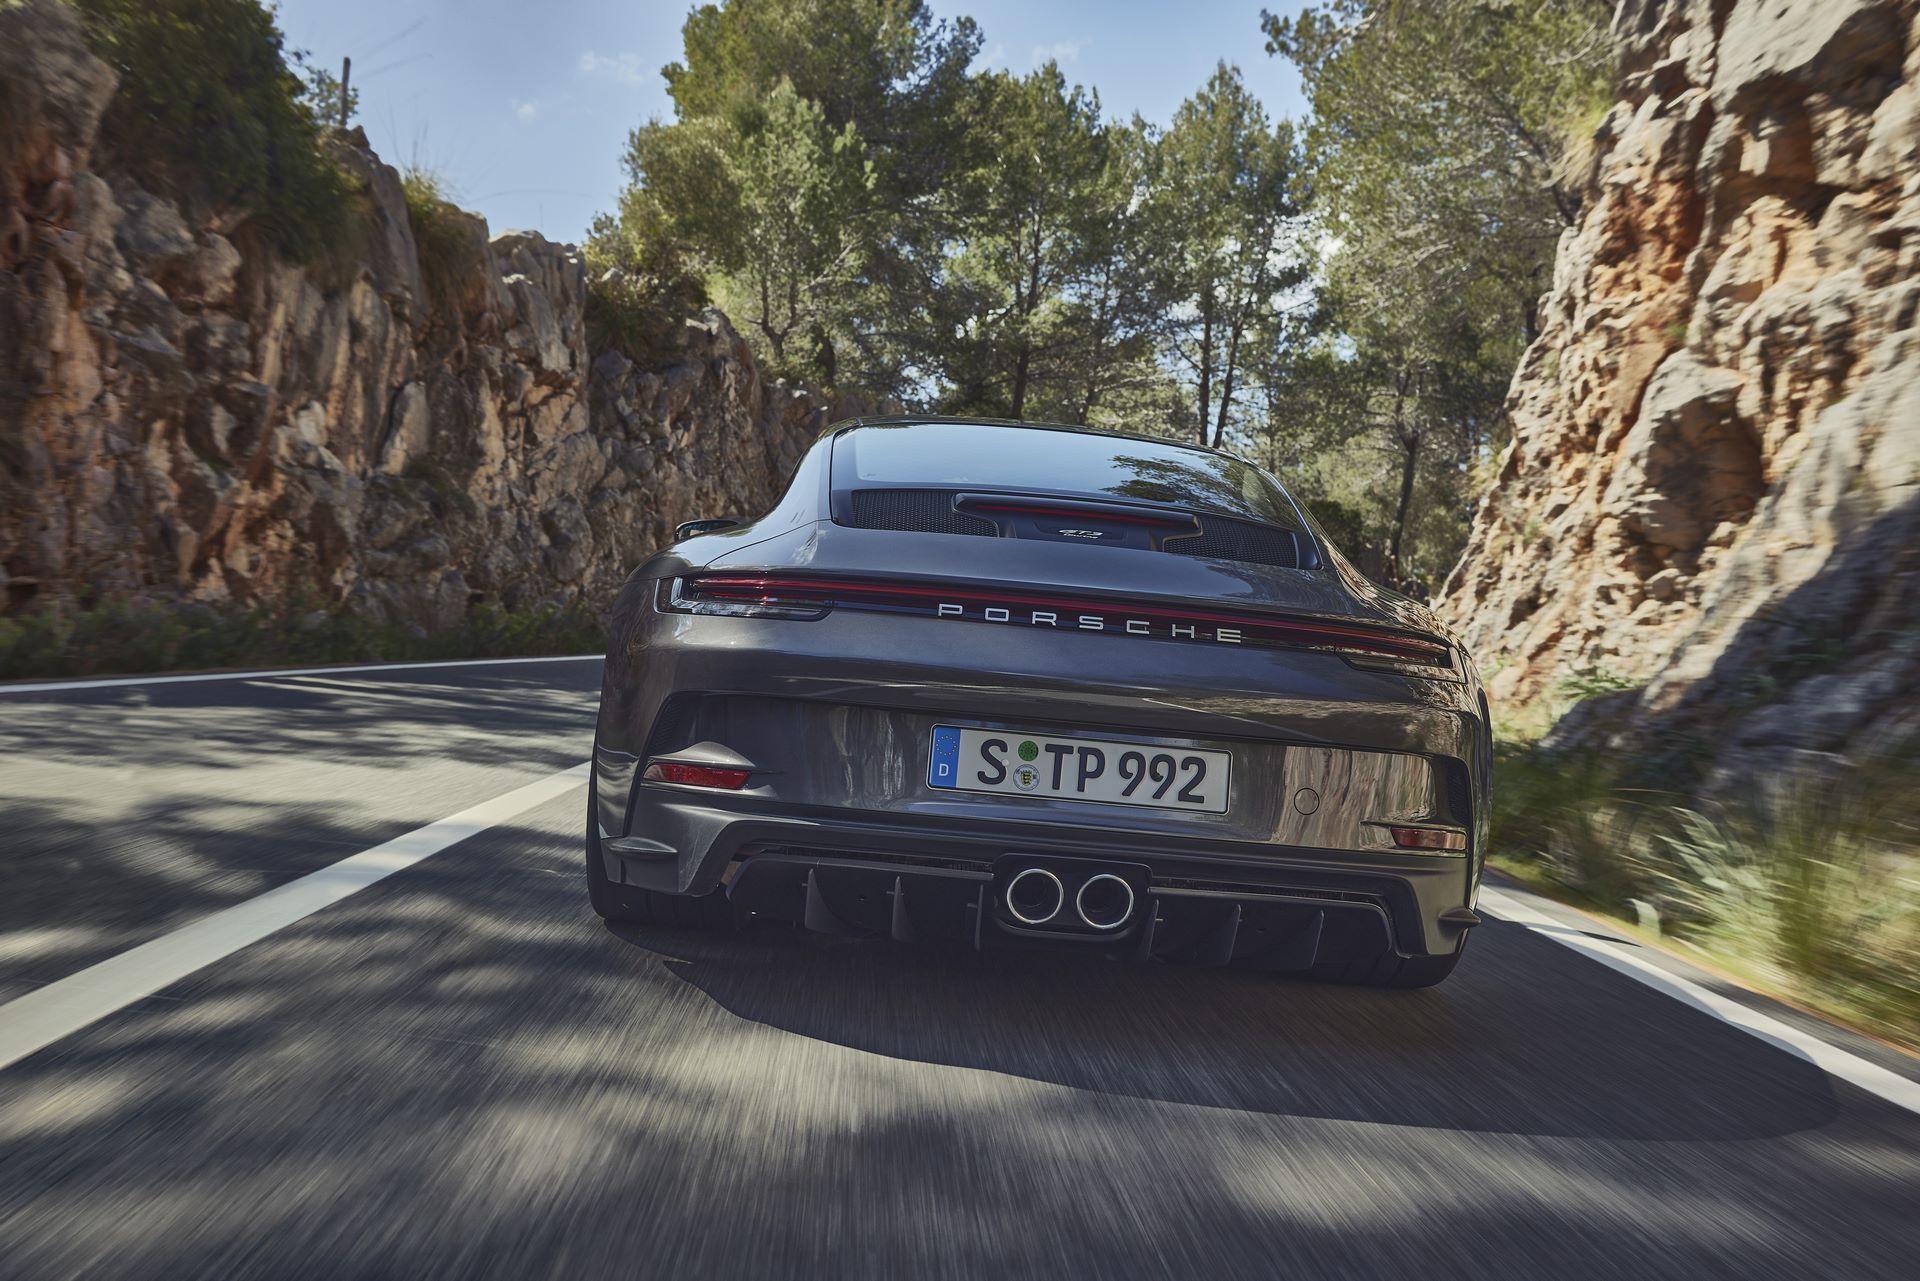 Porsche-911-GT3-Touring-Package-13